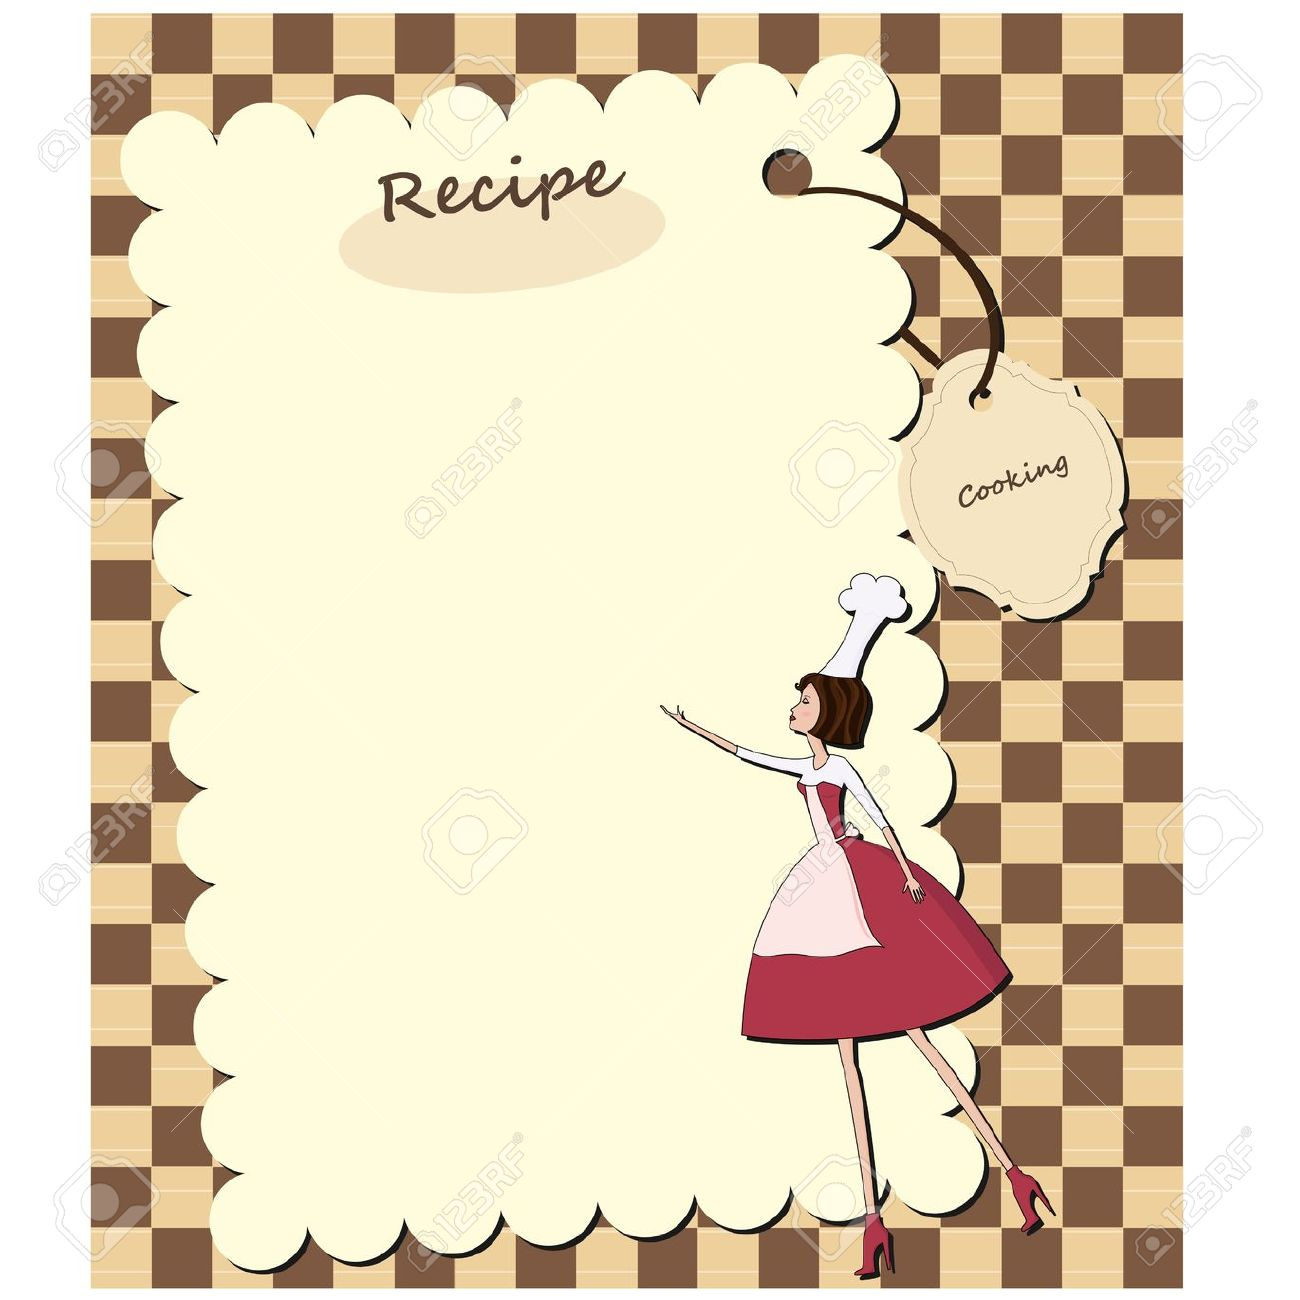 Rezepte bilder clipart clipart Recipe Clip Art Images | Clipart Panda - Free Clipart Images clipart